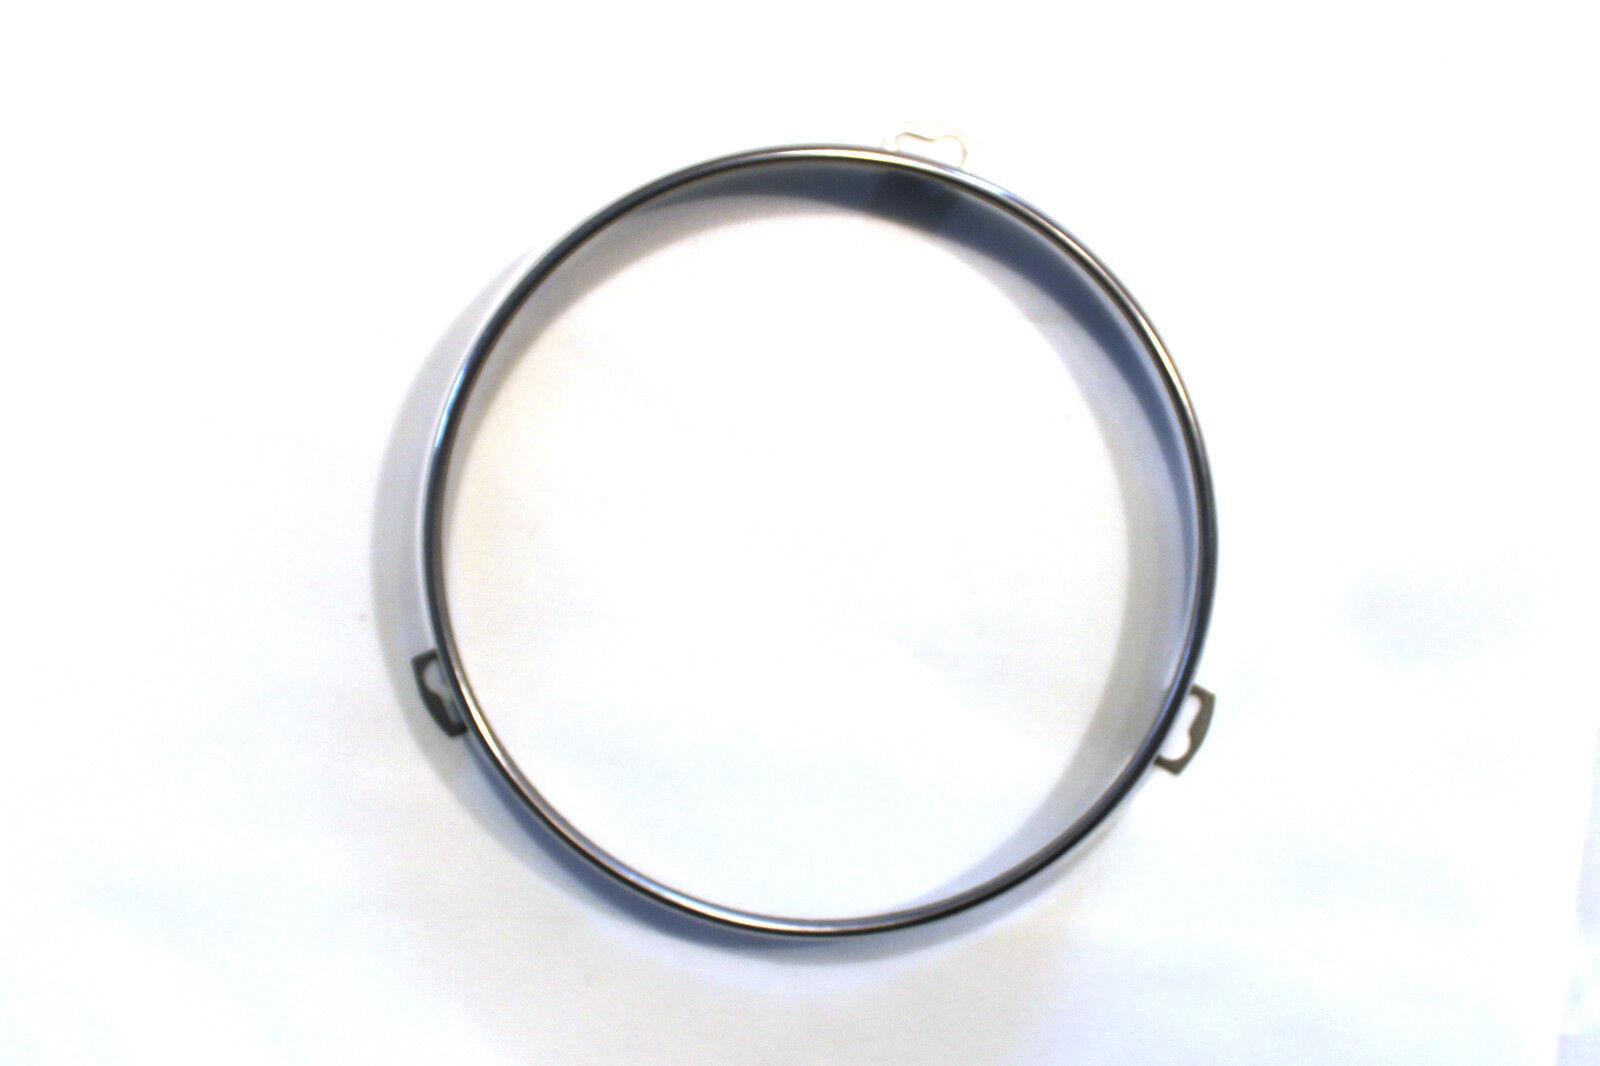 1965 1966 1967 1968 1970 1971 1972 1973 Mustang Headlight Retaining Trim Ring